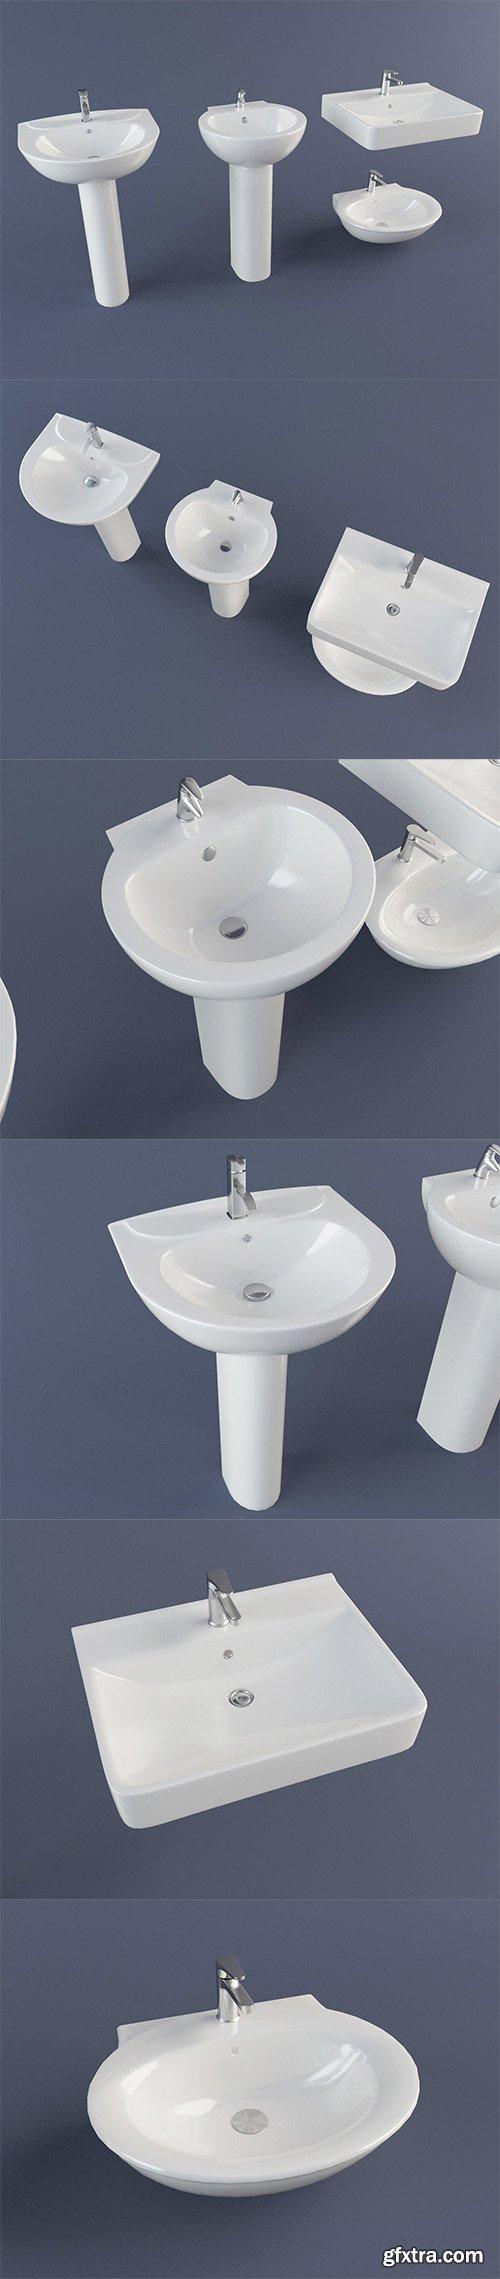 Cgtrader - Sink Pack 3D model